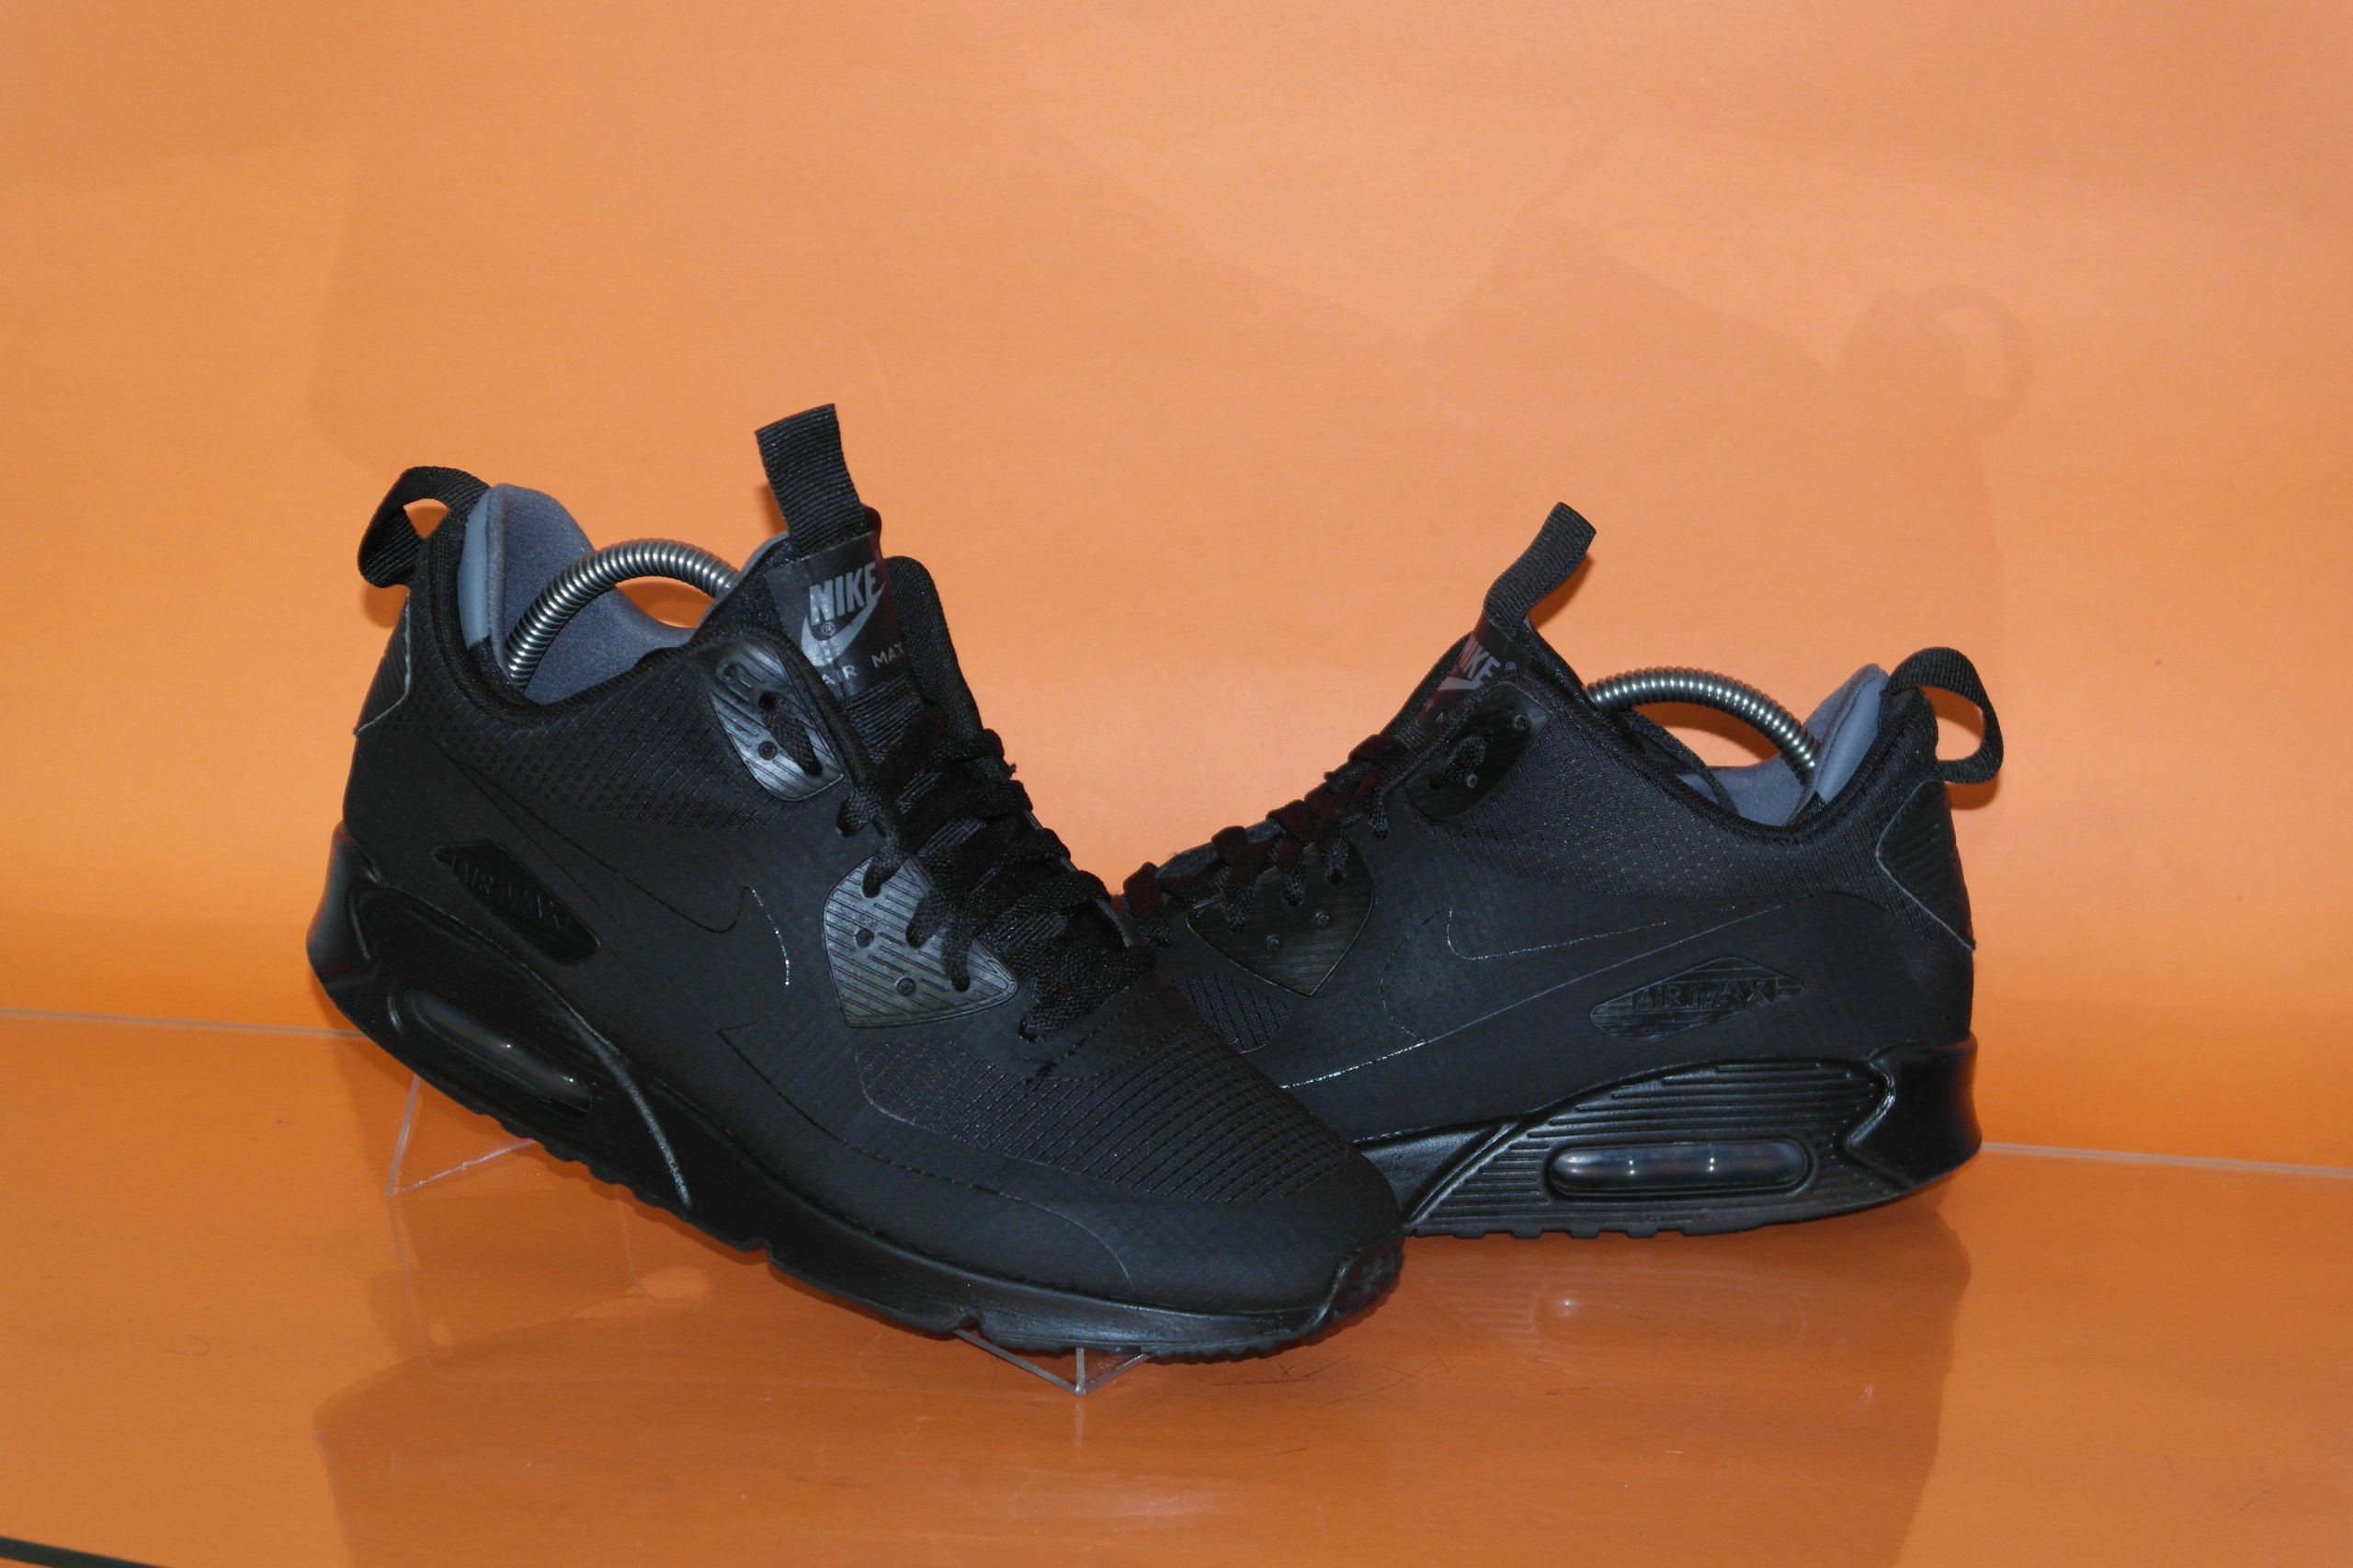 NIKE AIR MAX 90 MID WINTER buty sportowe r.42,5